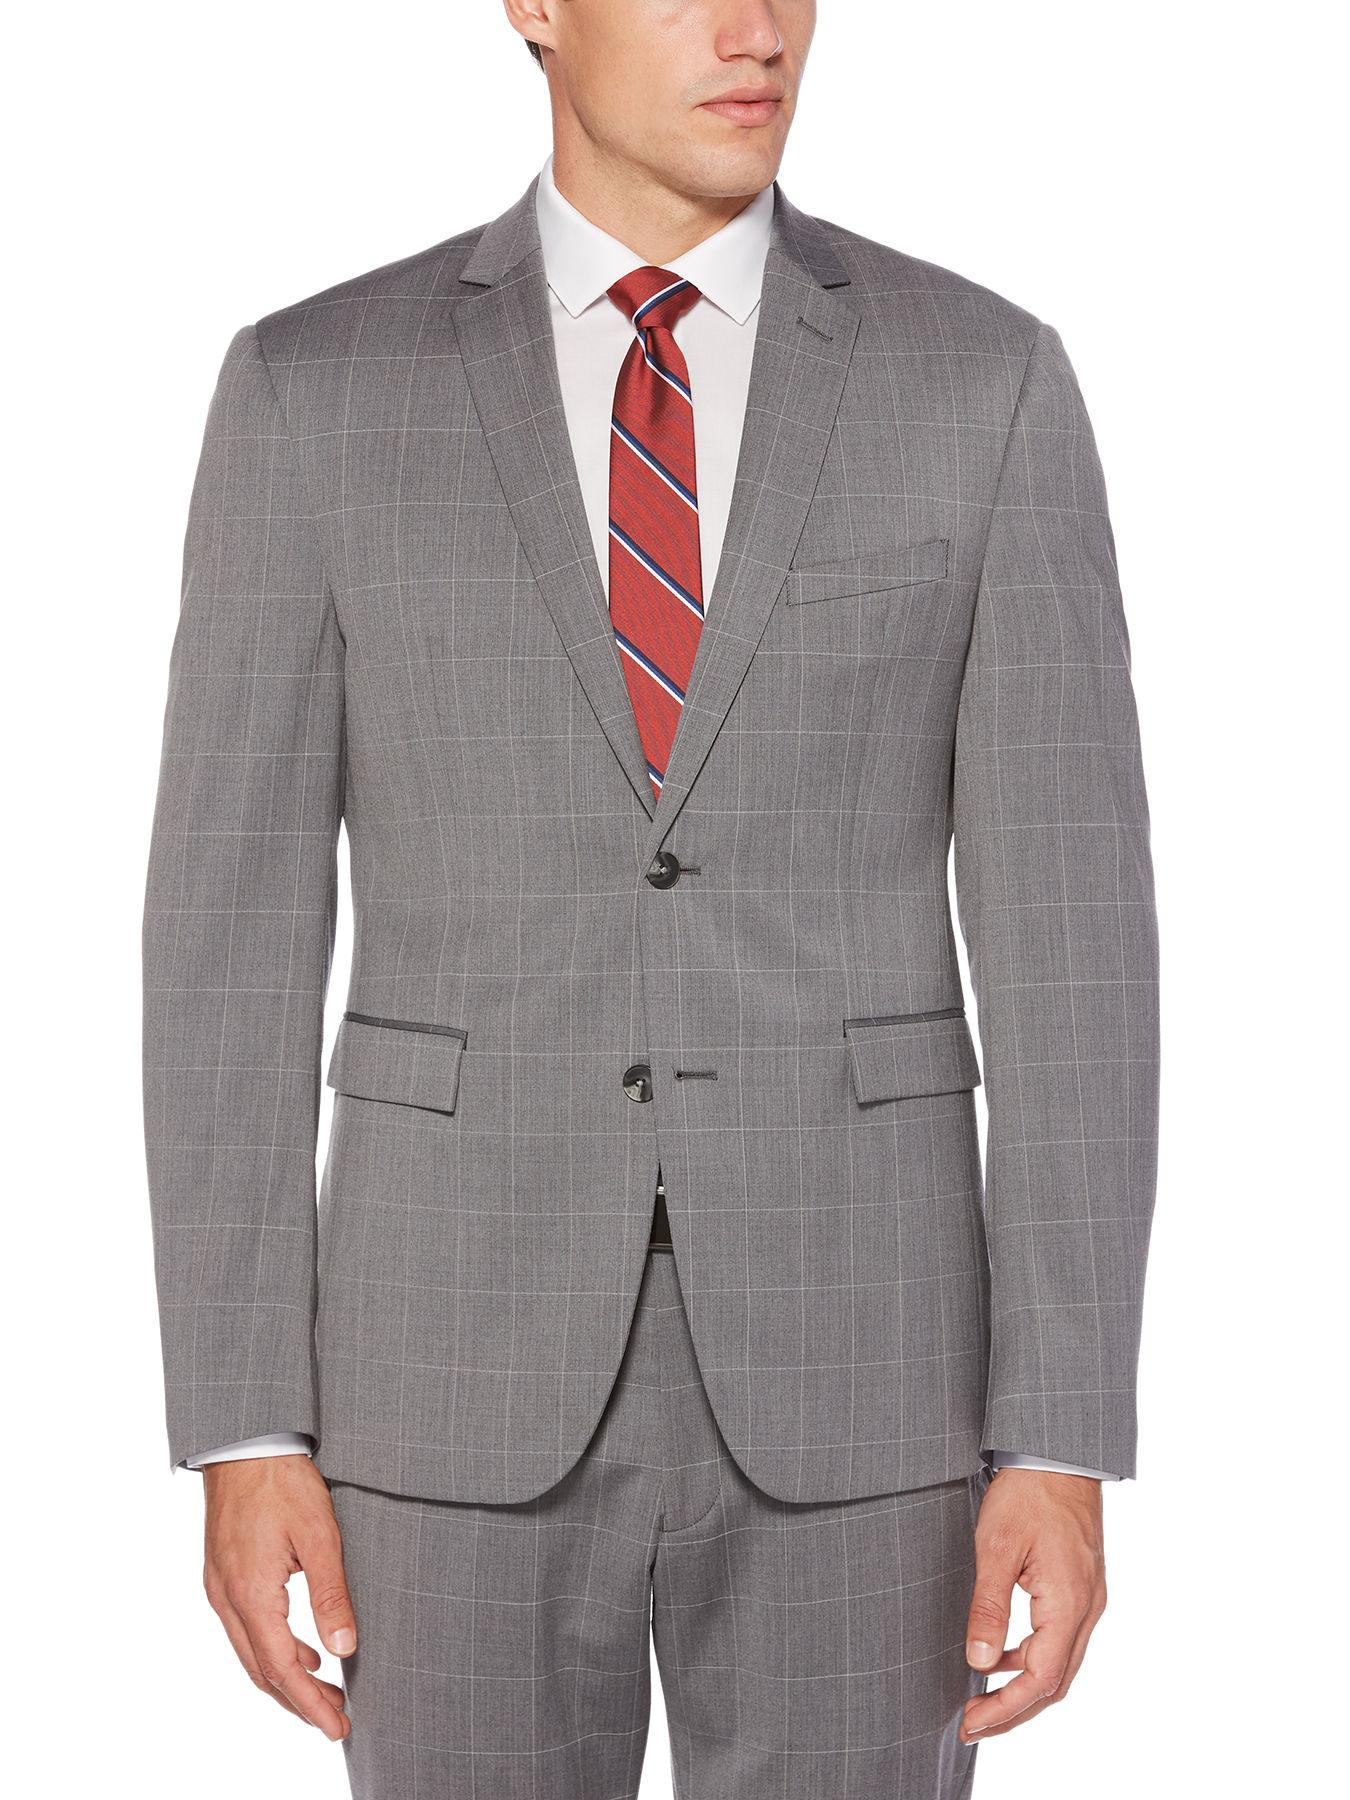 9fd7b7ab86 Lyst - Perry Ellis Slim Windowpane Suit Jacket in Gray for Men